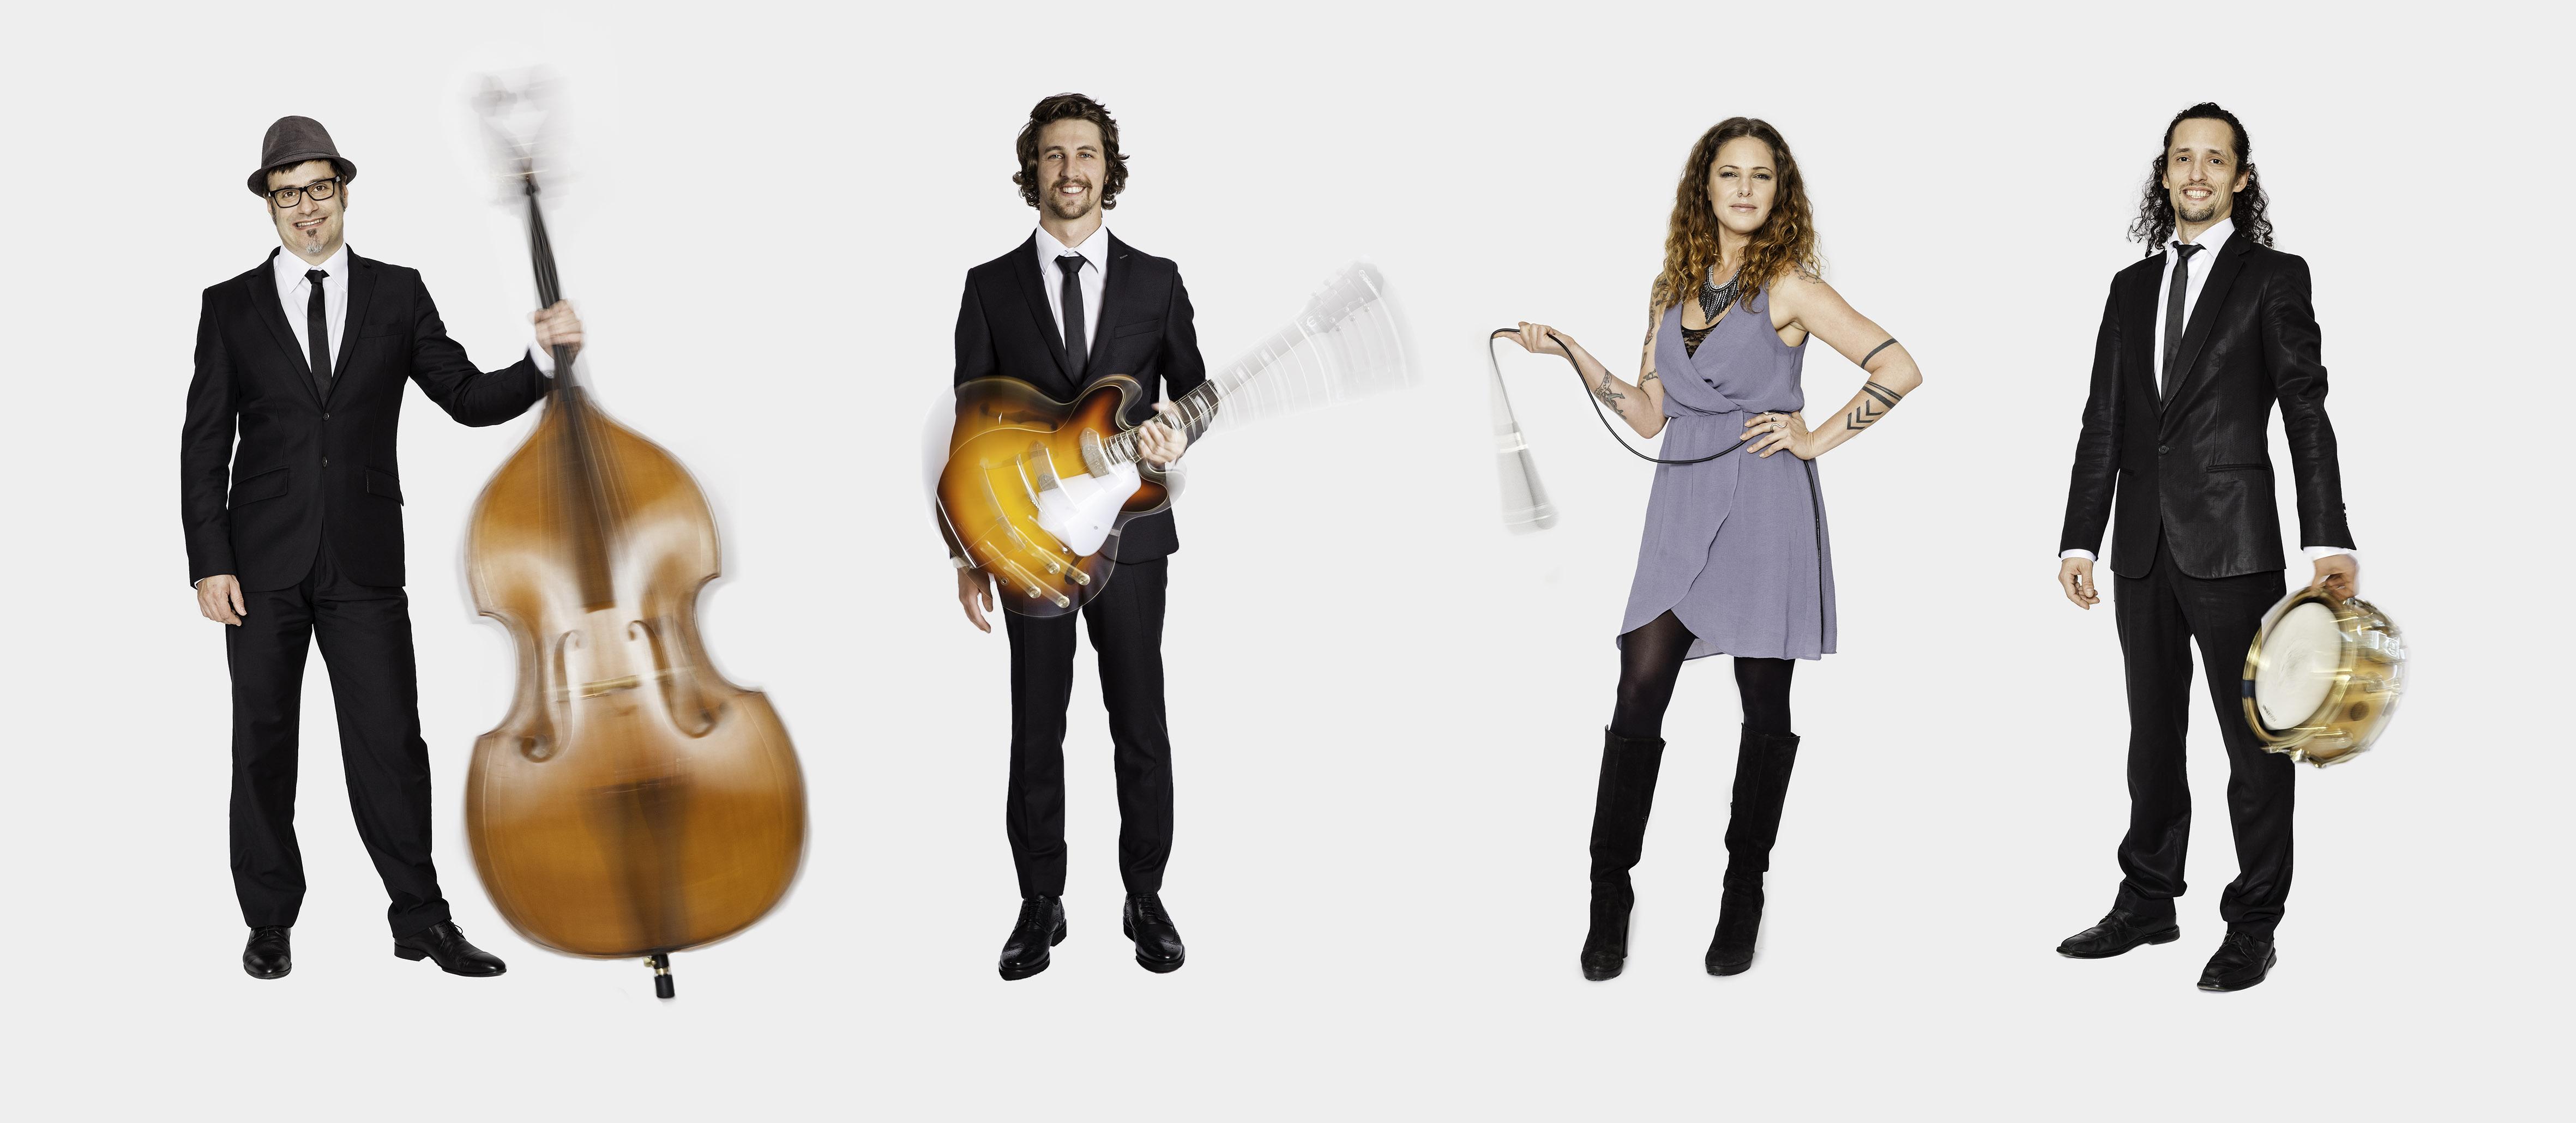 B.Streetband Quartet Hochzeitsband Tirol